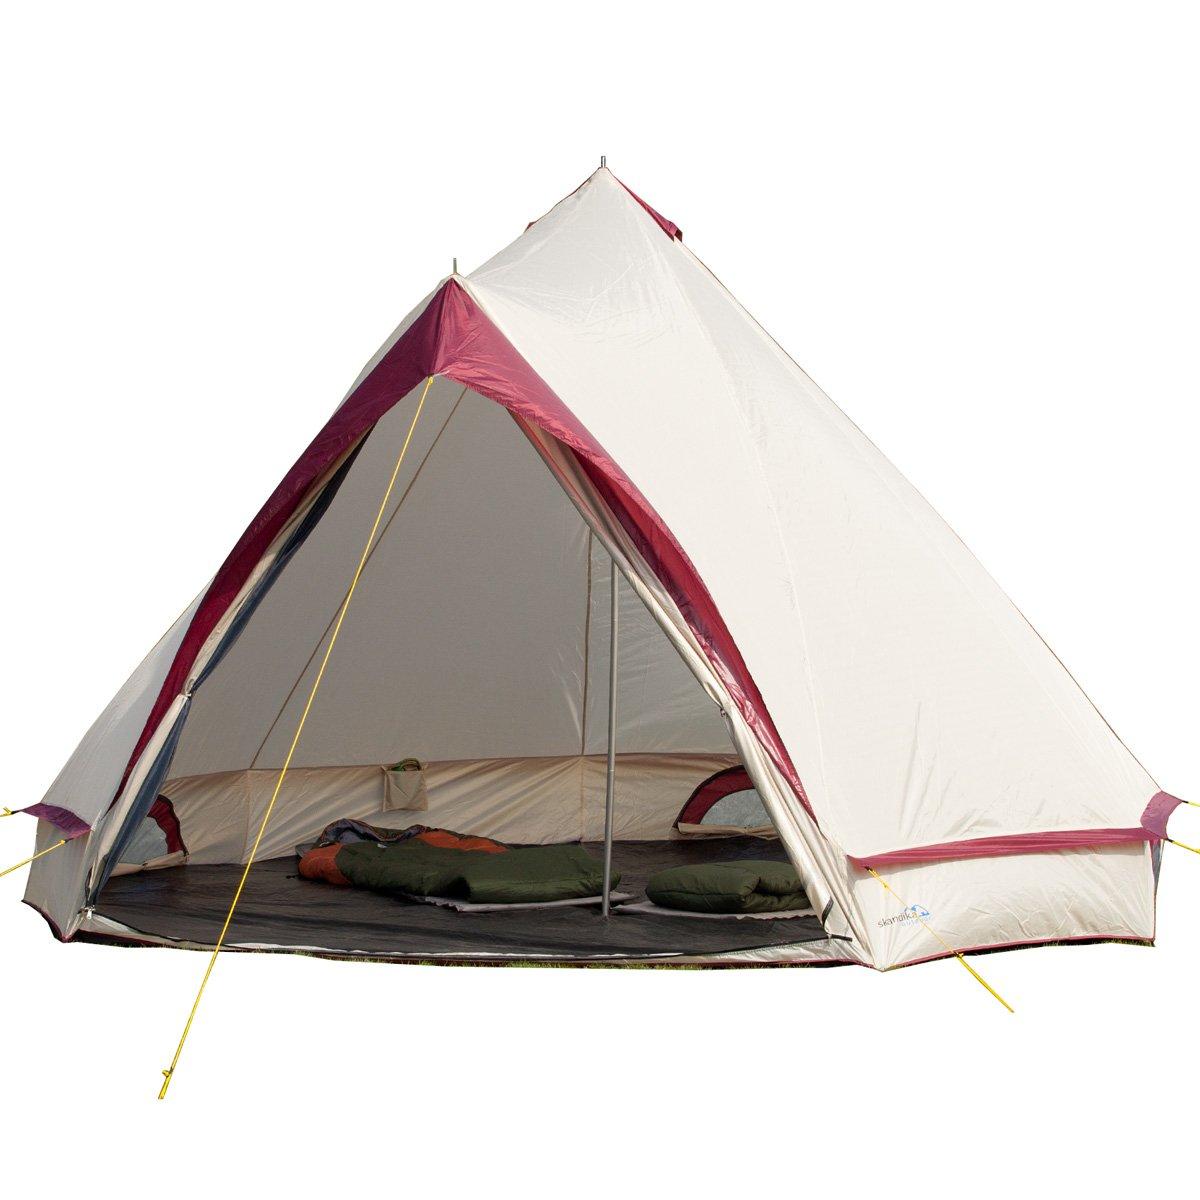 Camping Zelt 8 Mann : Camping zelt für personen outdoor familienzelt